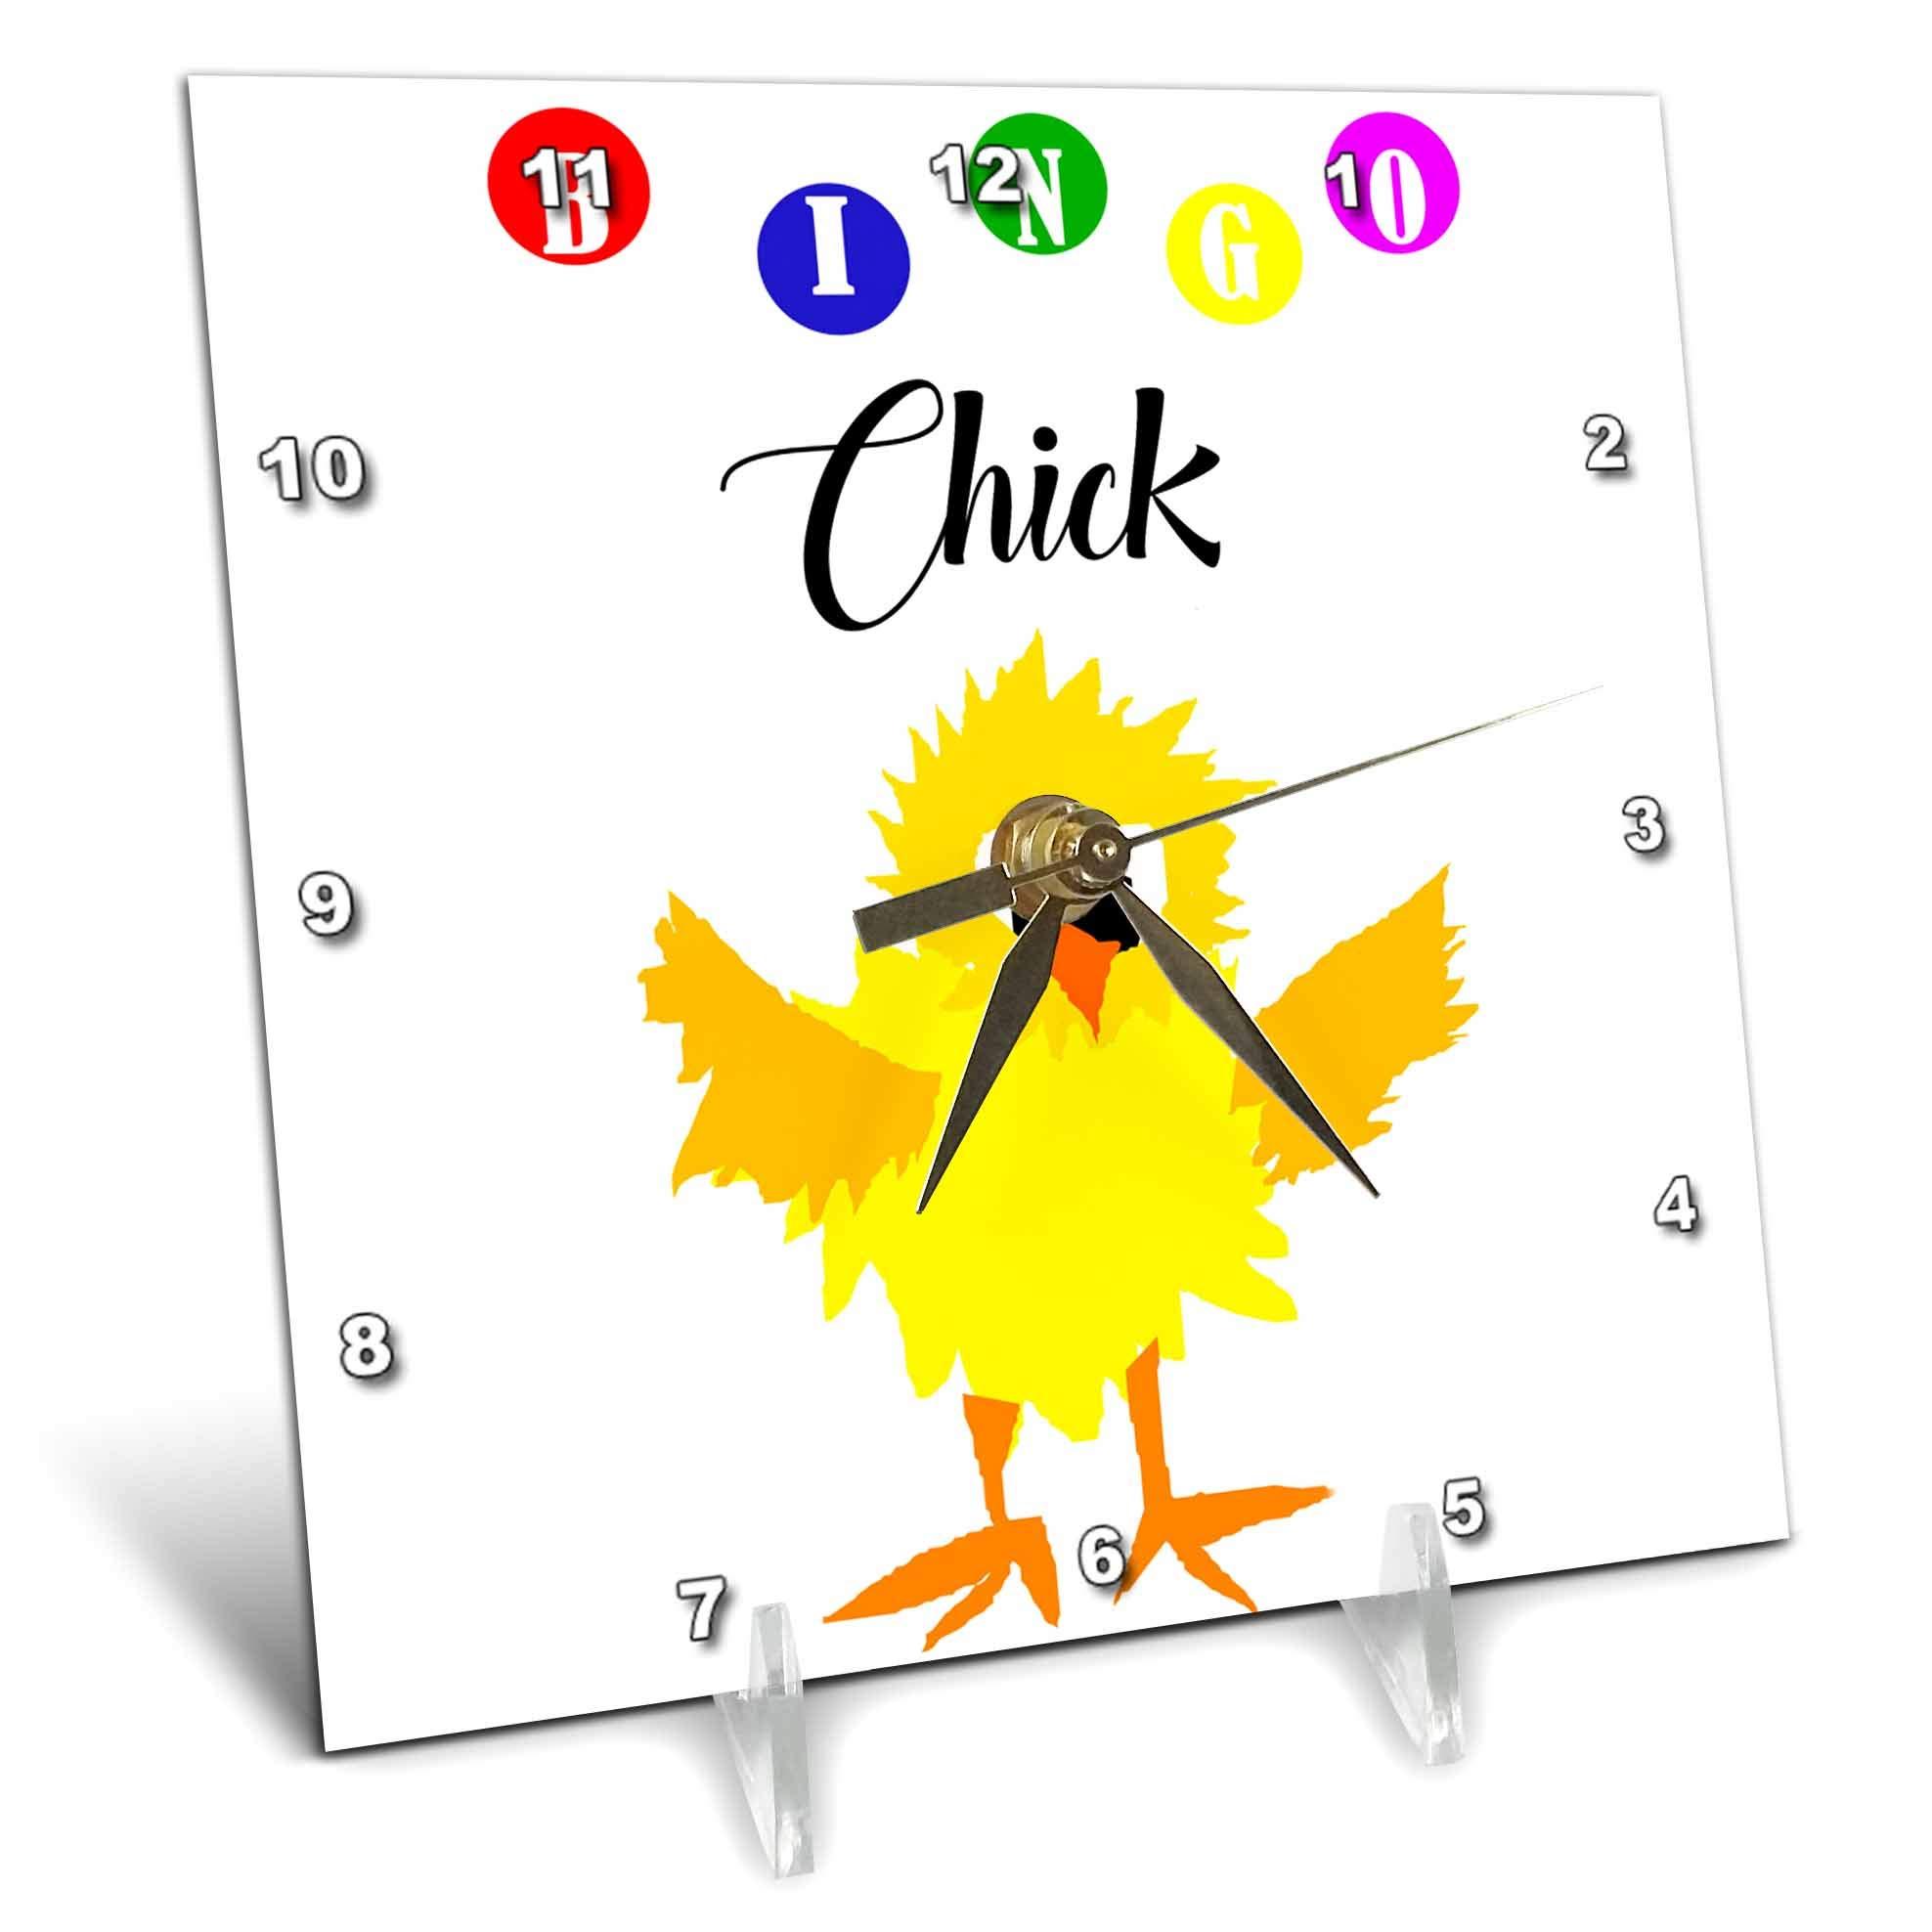 3dRose All Smiles Art Sports and Hobbies - Funny Bingo Chick Playing Bingo Cartoon - 6x6 Desk Clock (dc_288050_1) by 3dRose